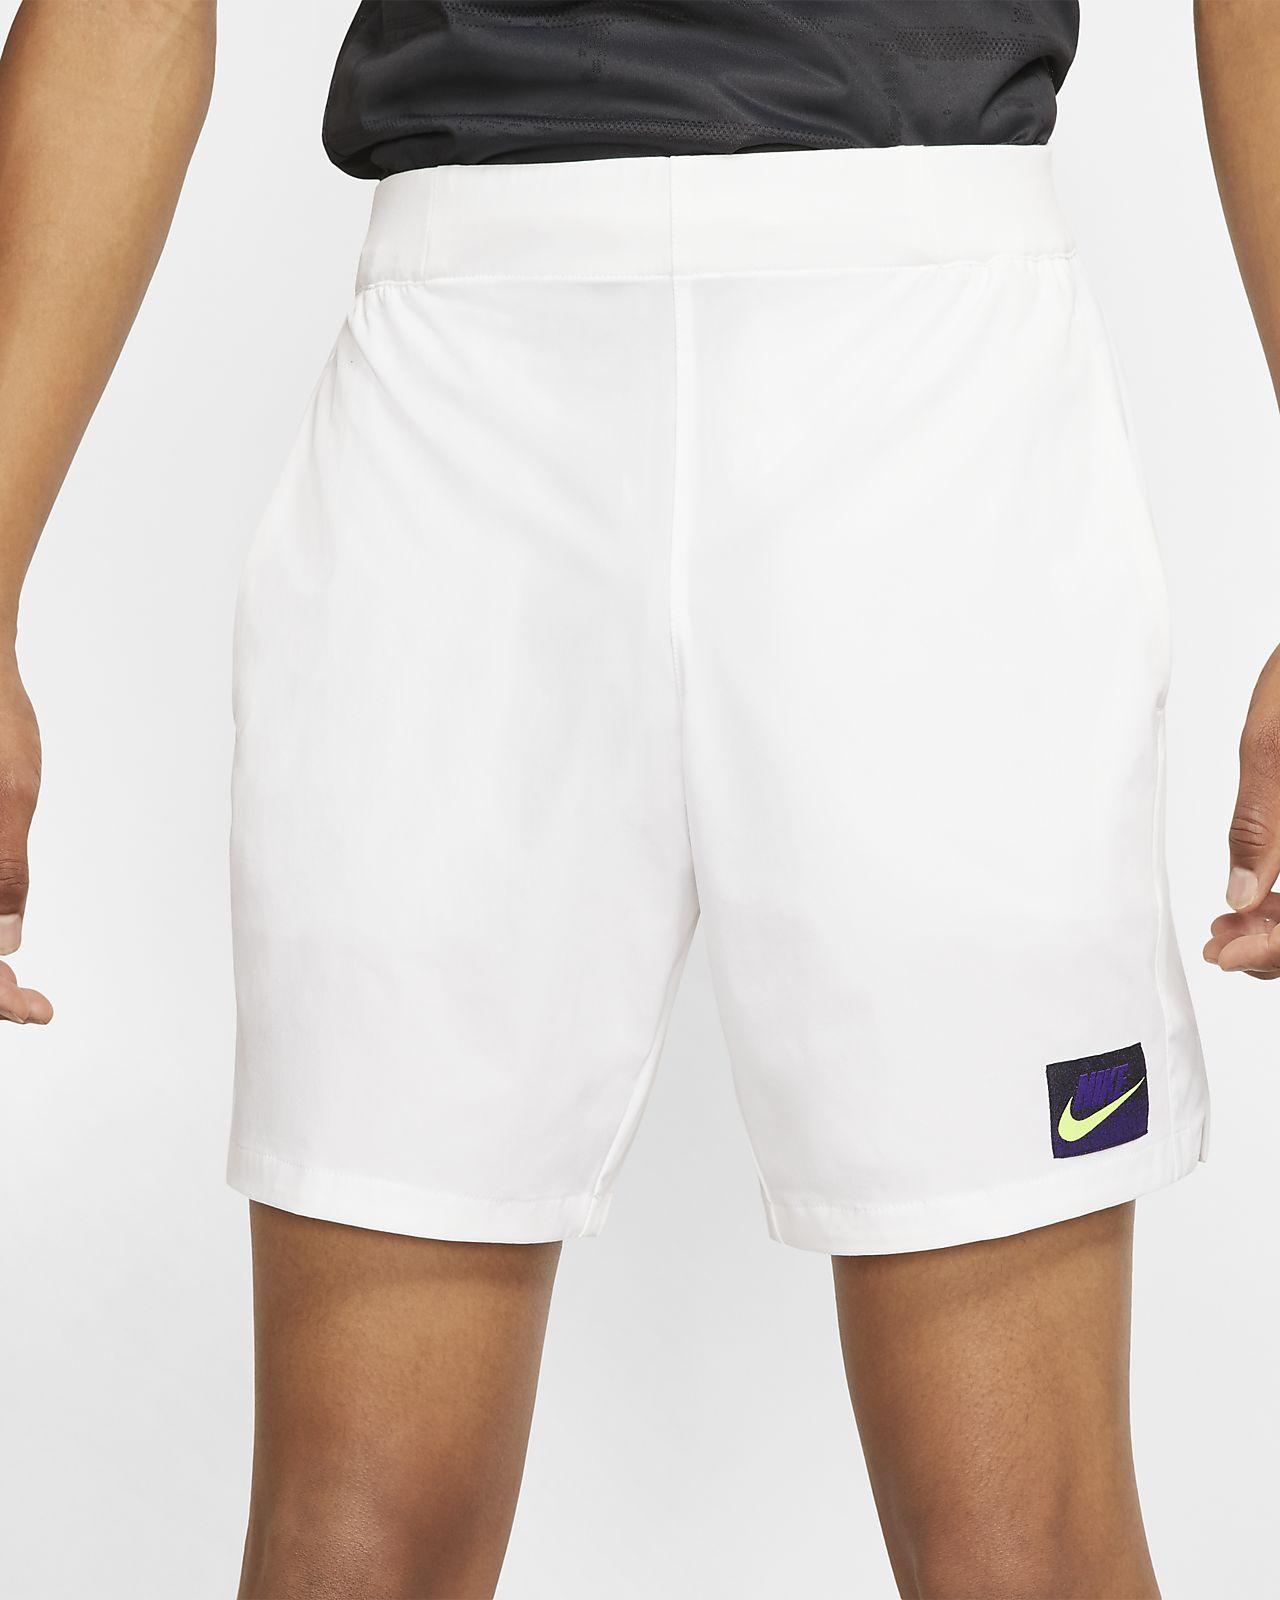 NikeCourt Flex Ace Erkek Tenis Şortu